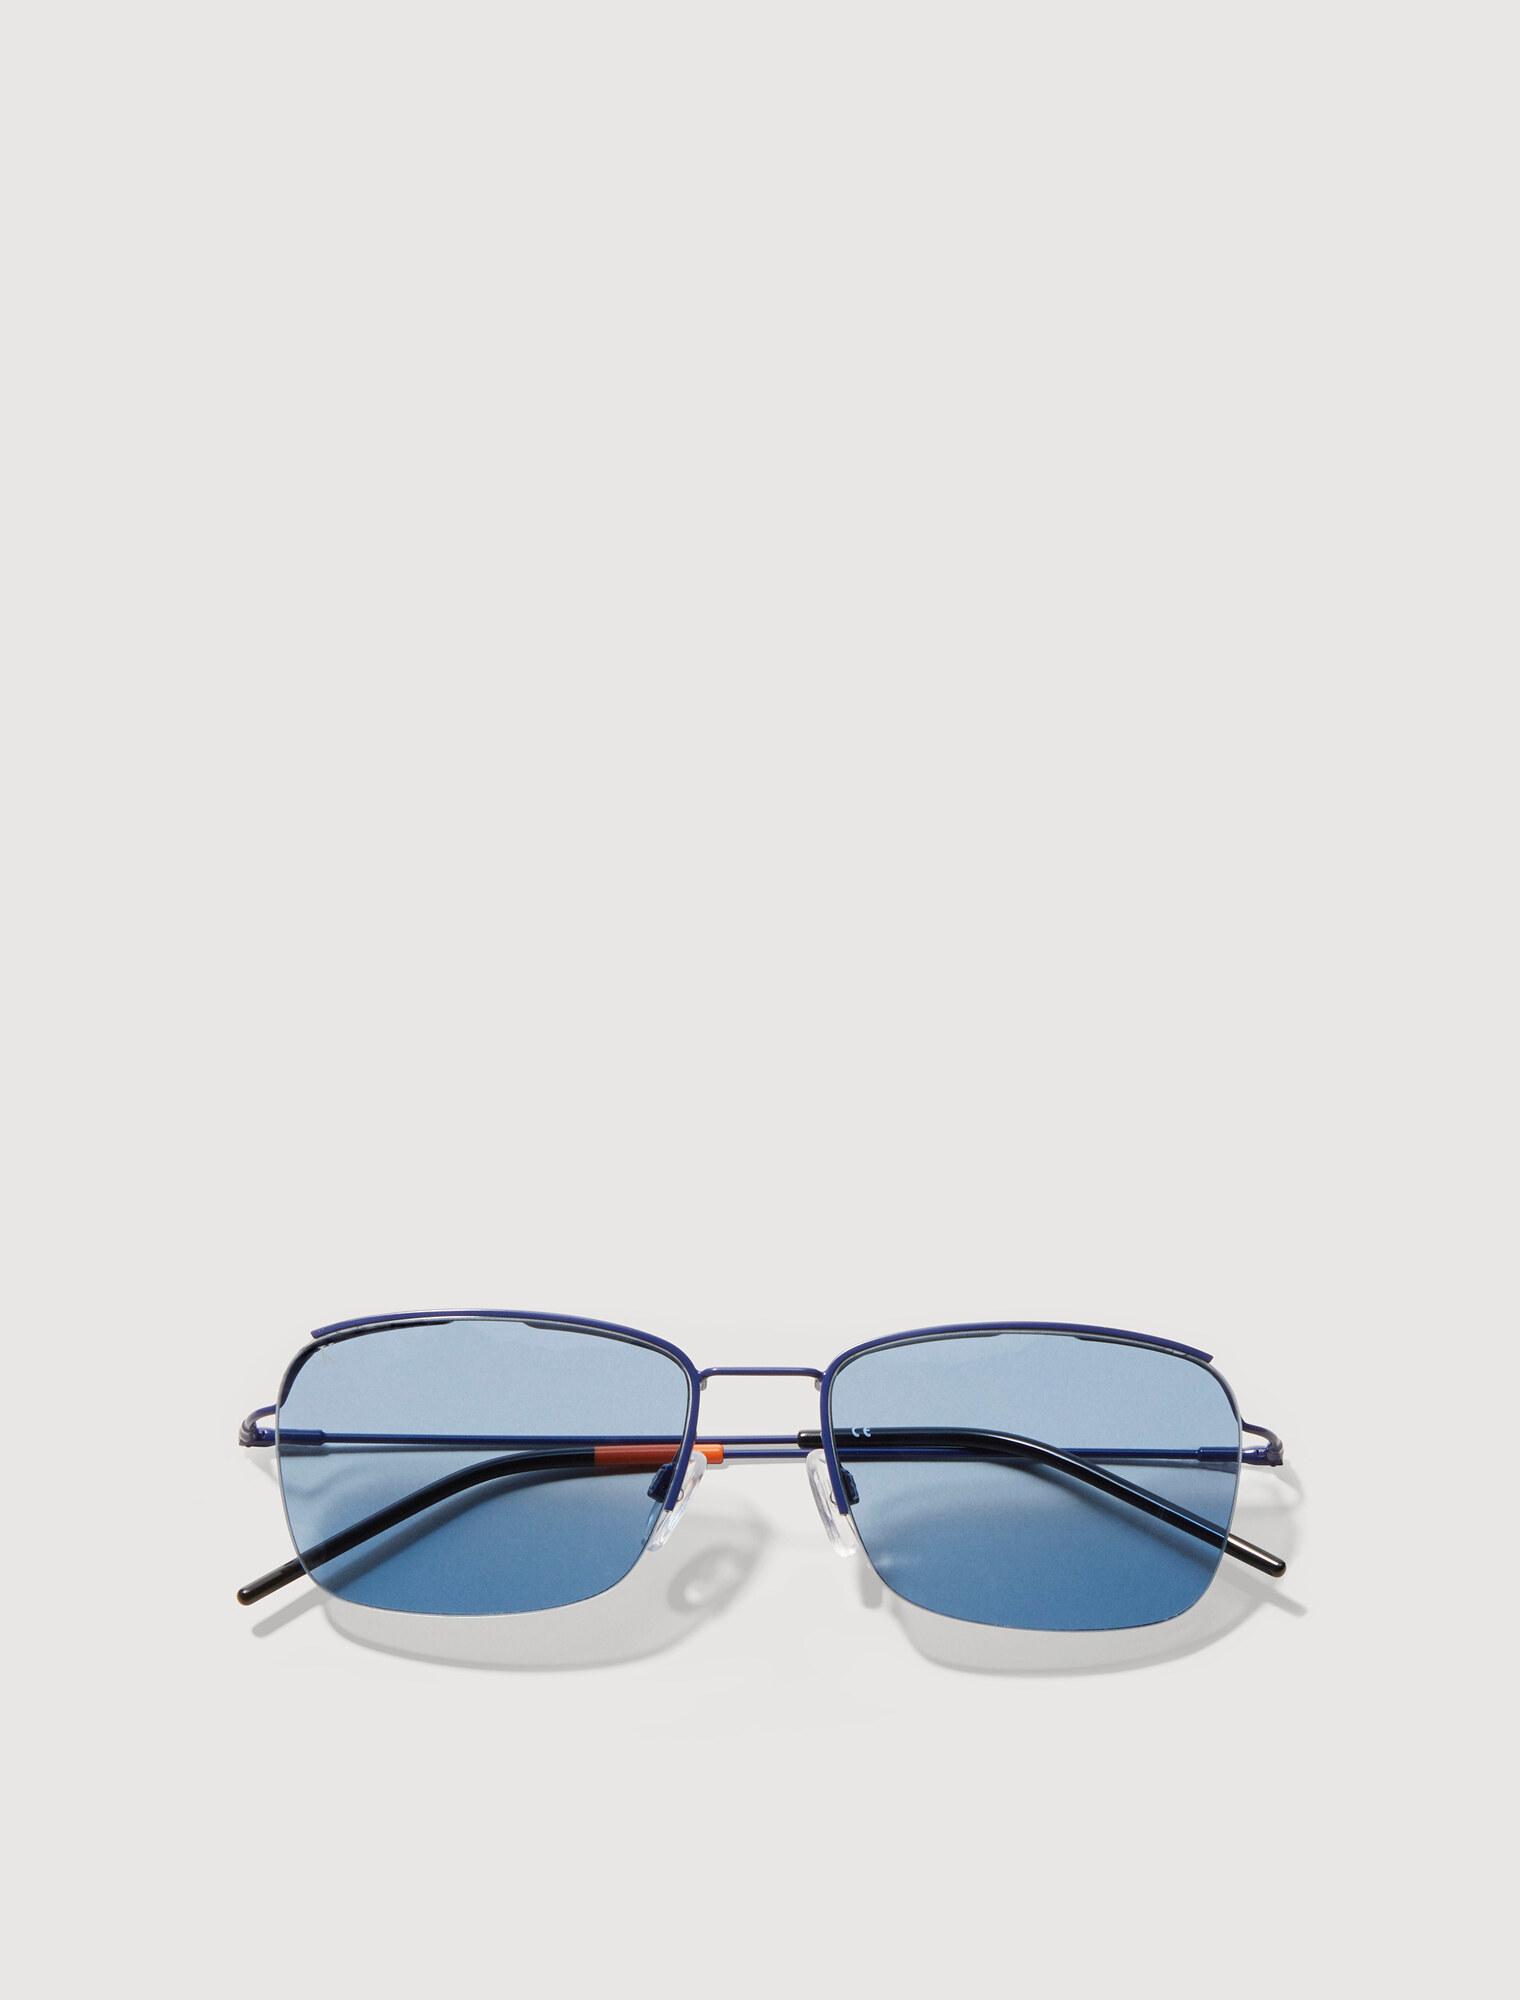 Heron Preston x Calvin Klein Collezione SP21